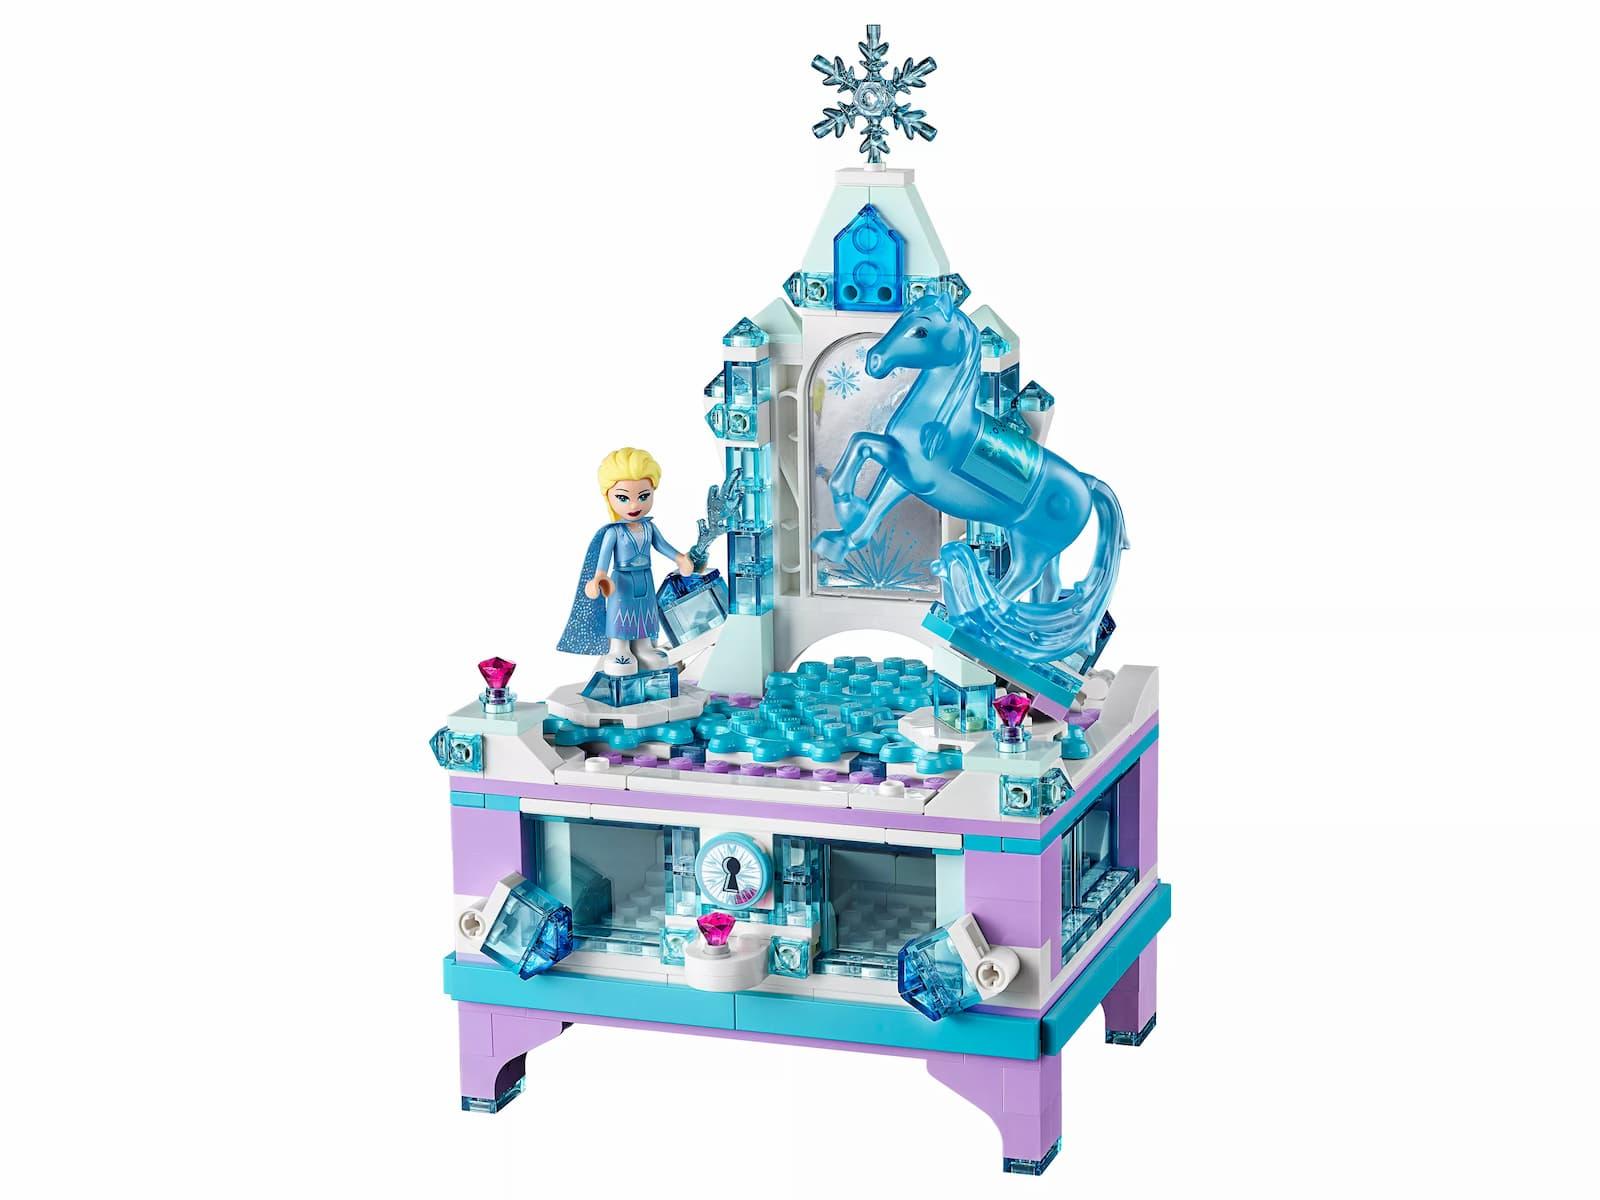 Конструктор SY «Шкатулка Эльзы» SY1442 (Disney Princess 41168) / 520 деталей